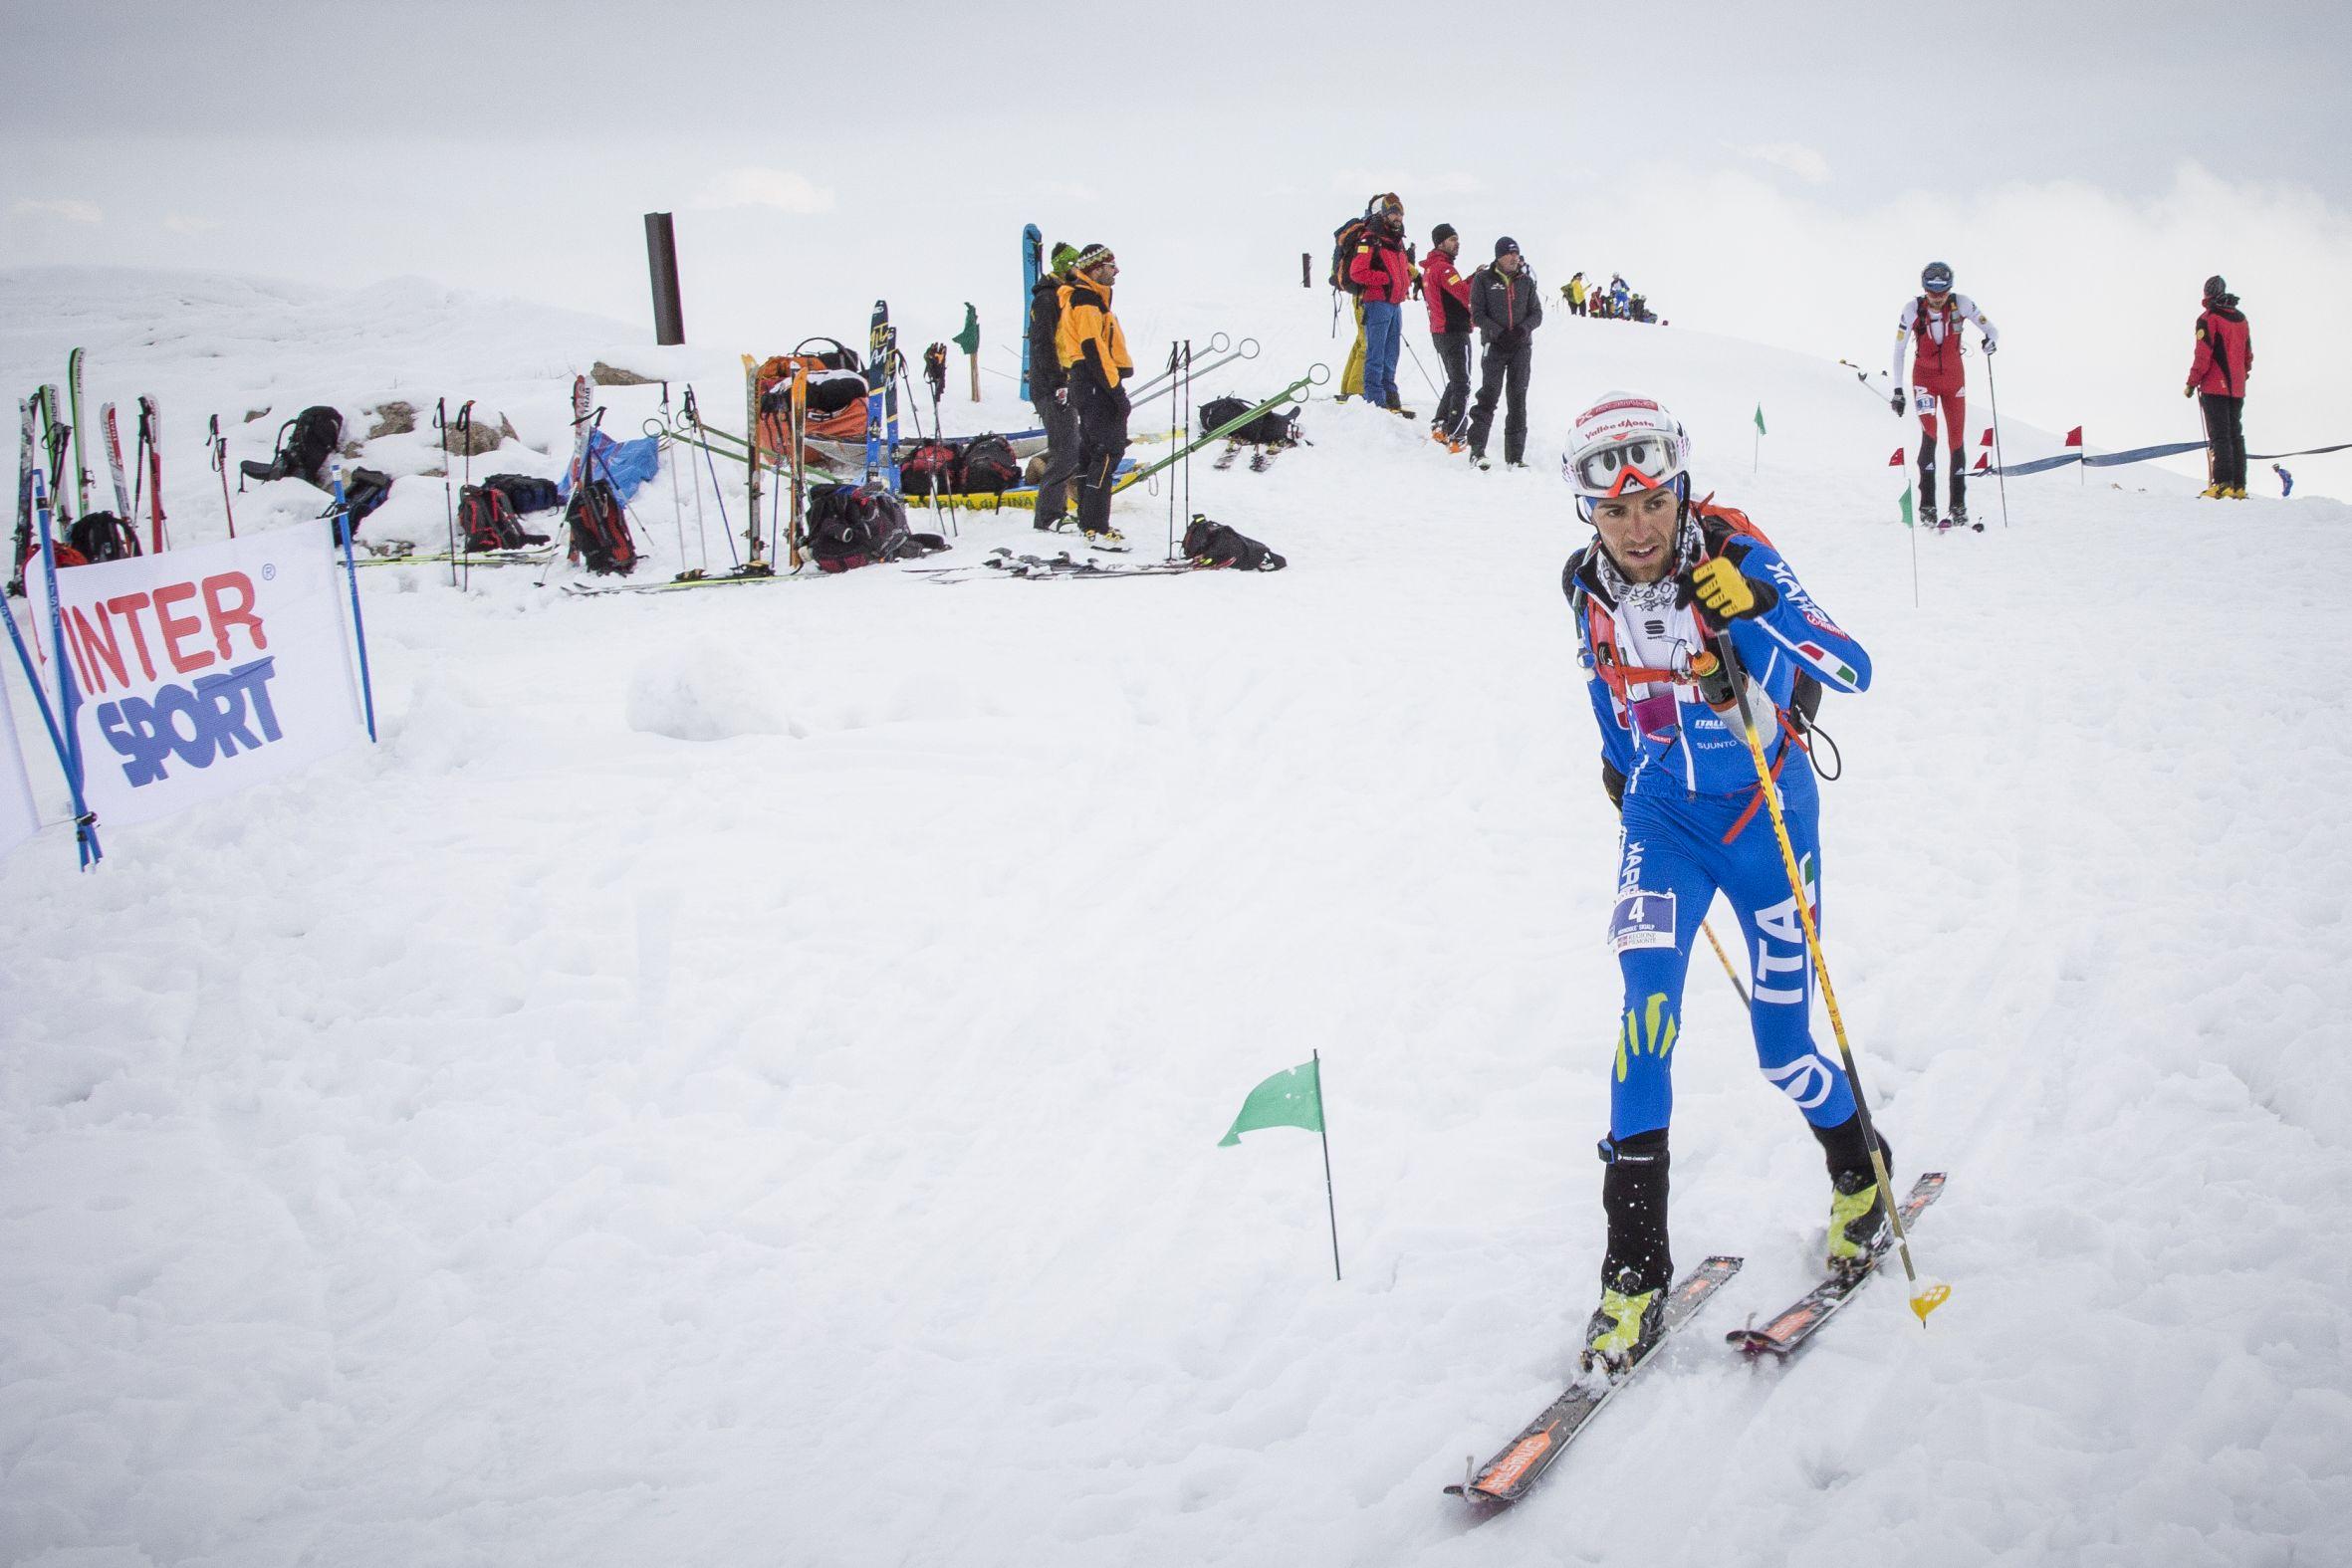 Matteo_Eydallin_team_scarpa_2017_skialp